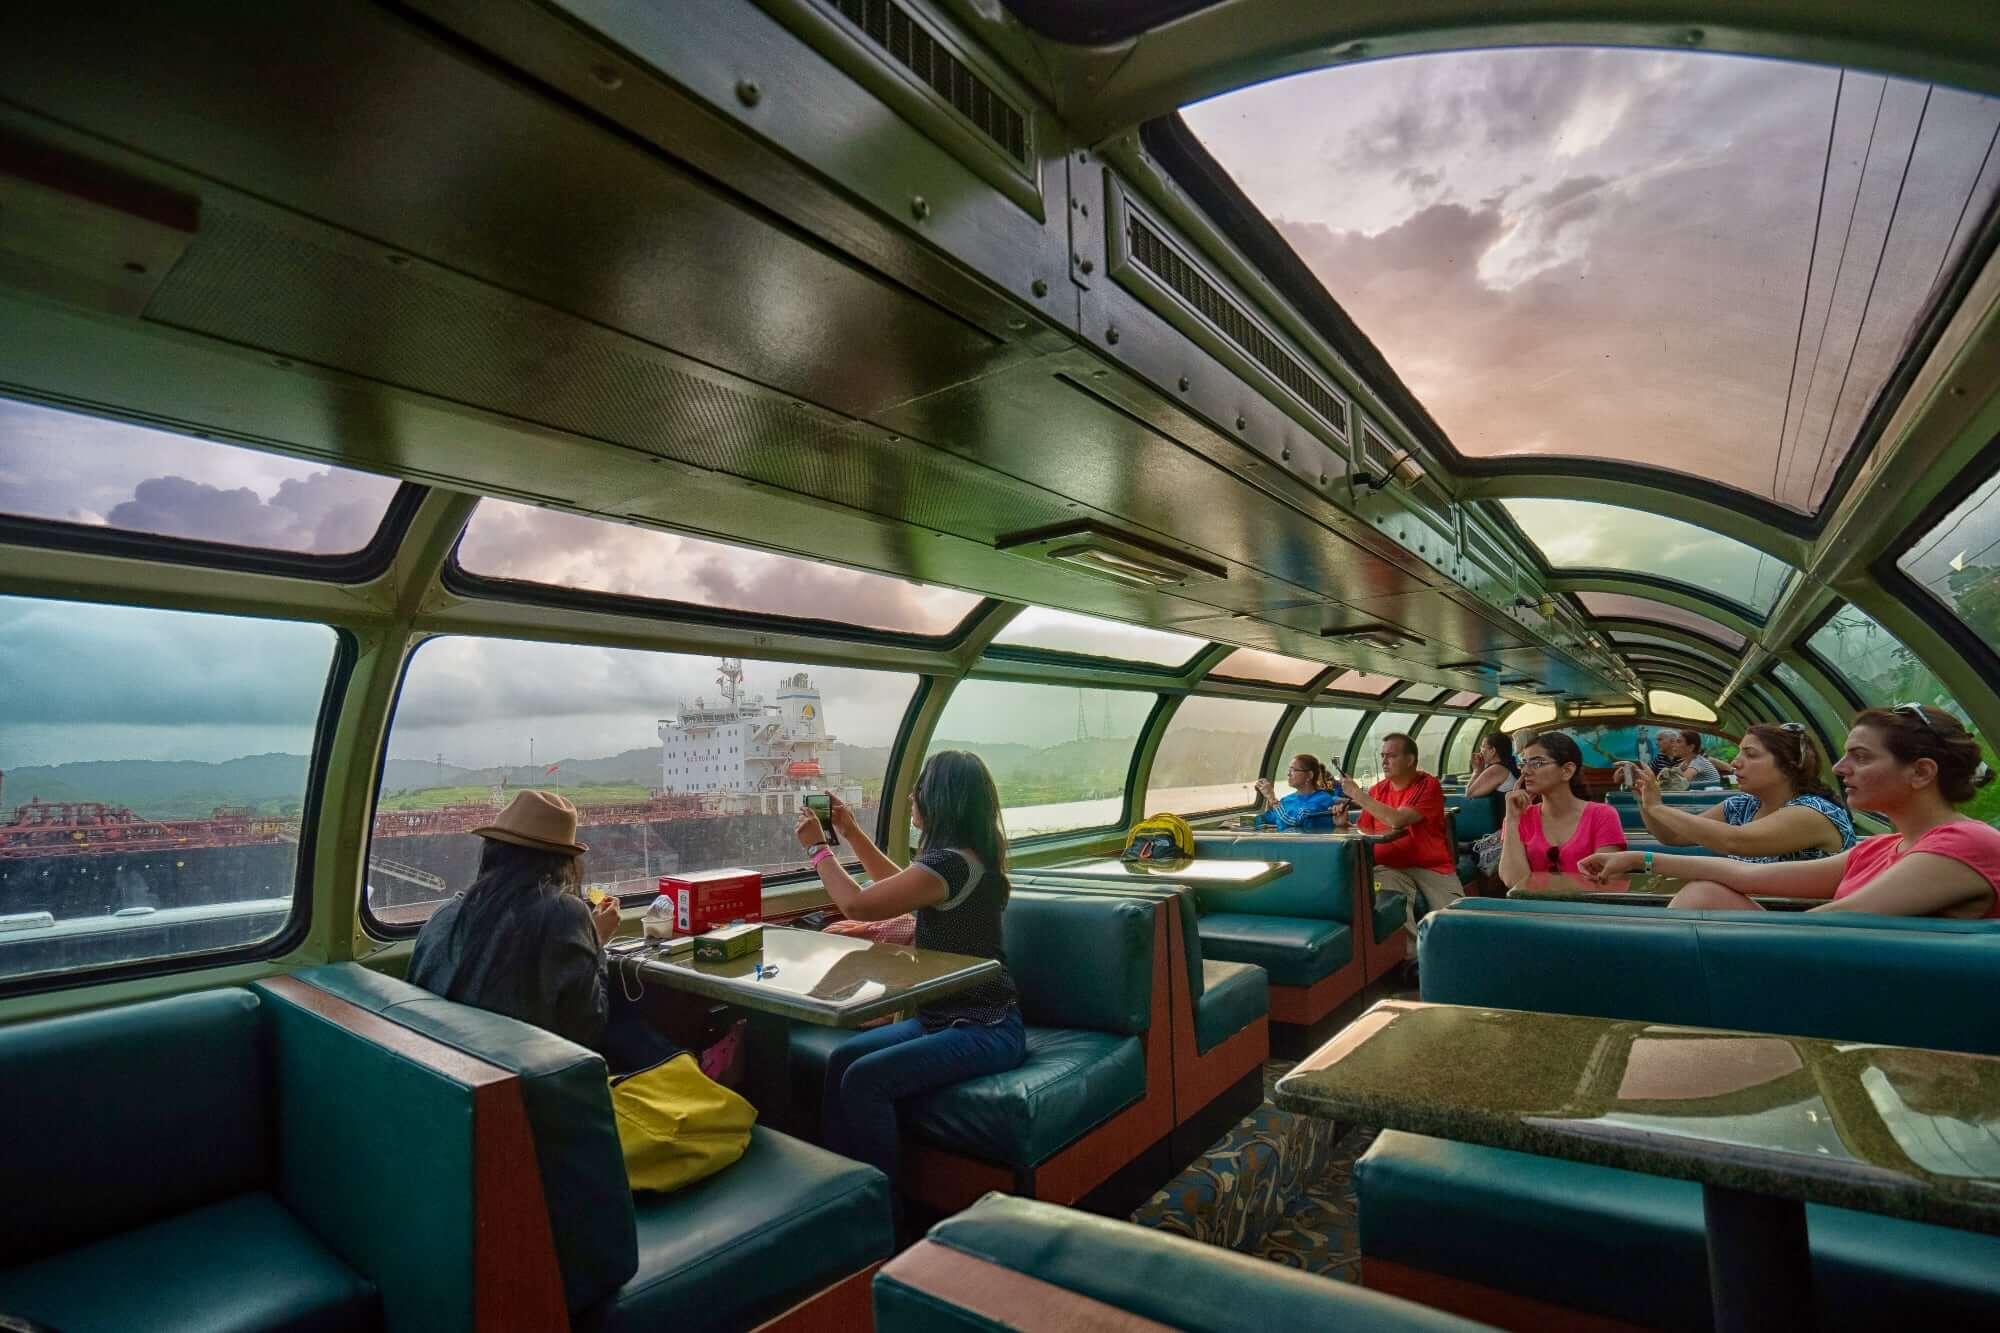 Dome Car of the Transoceanic Train or Panama Canal Railway, Panama